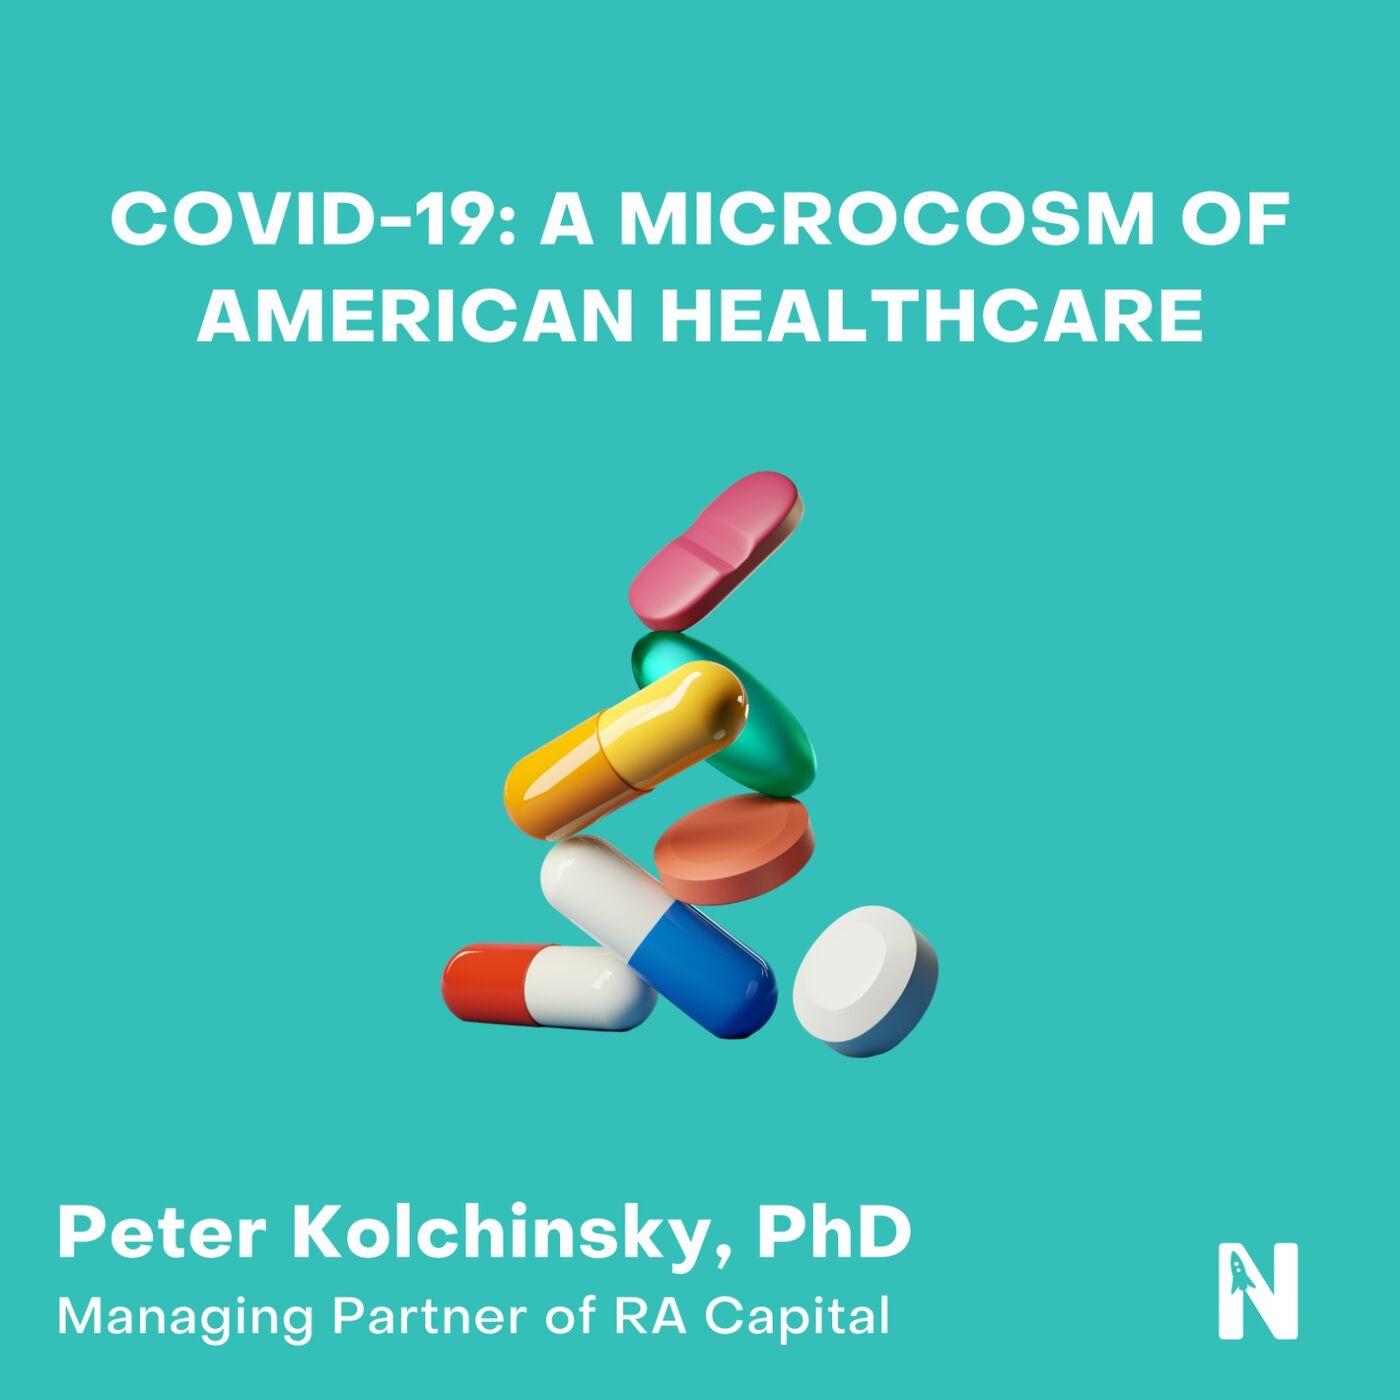 COVID-19: A Microcosm of American Healthcare   Peter Kolchinsky